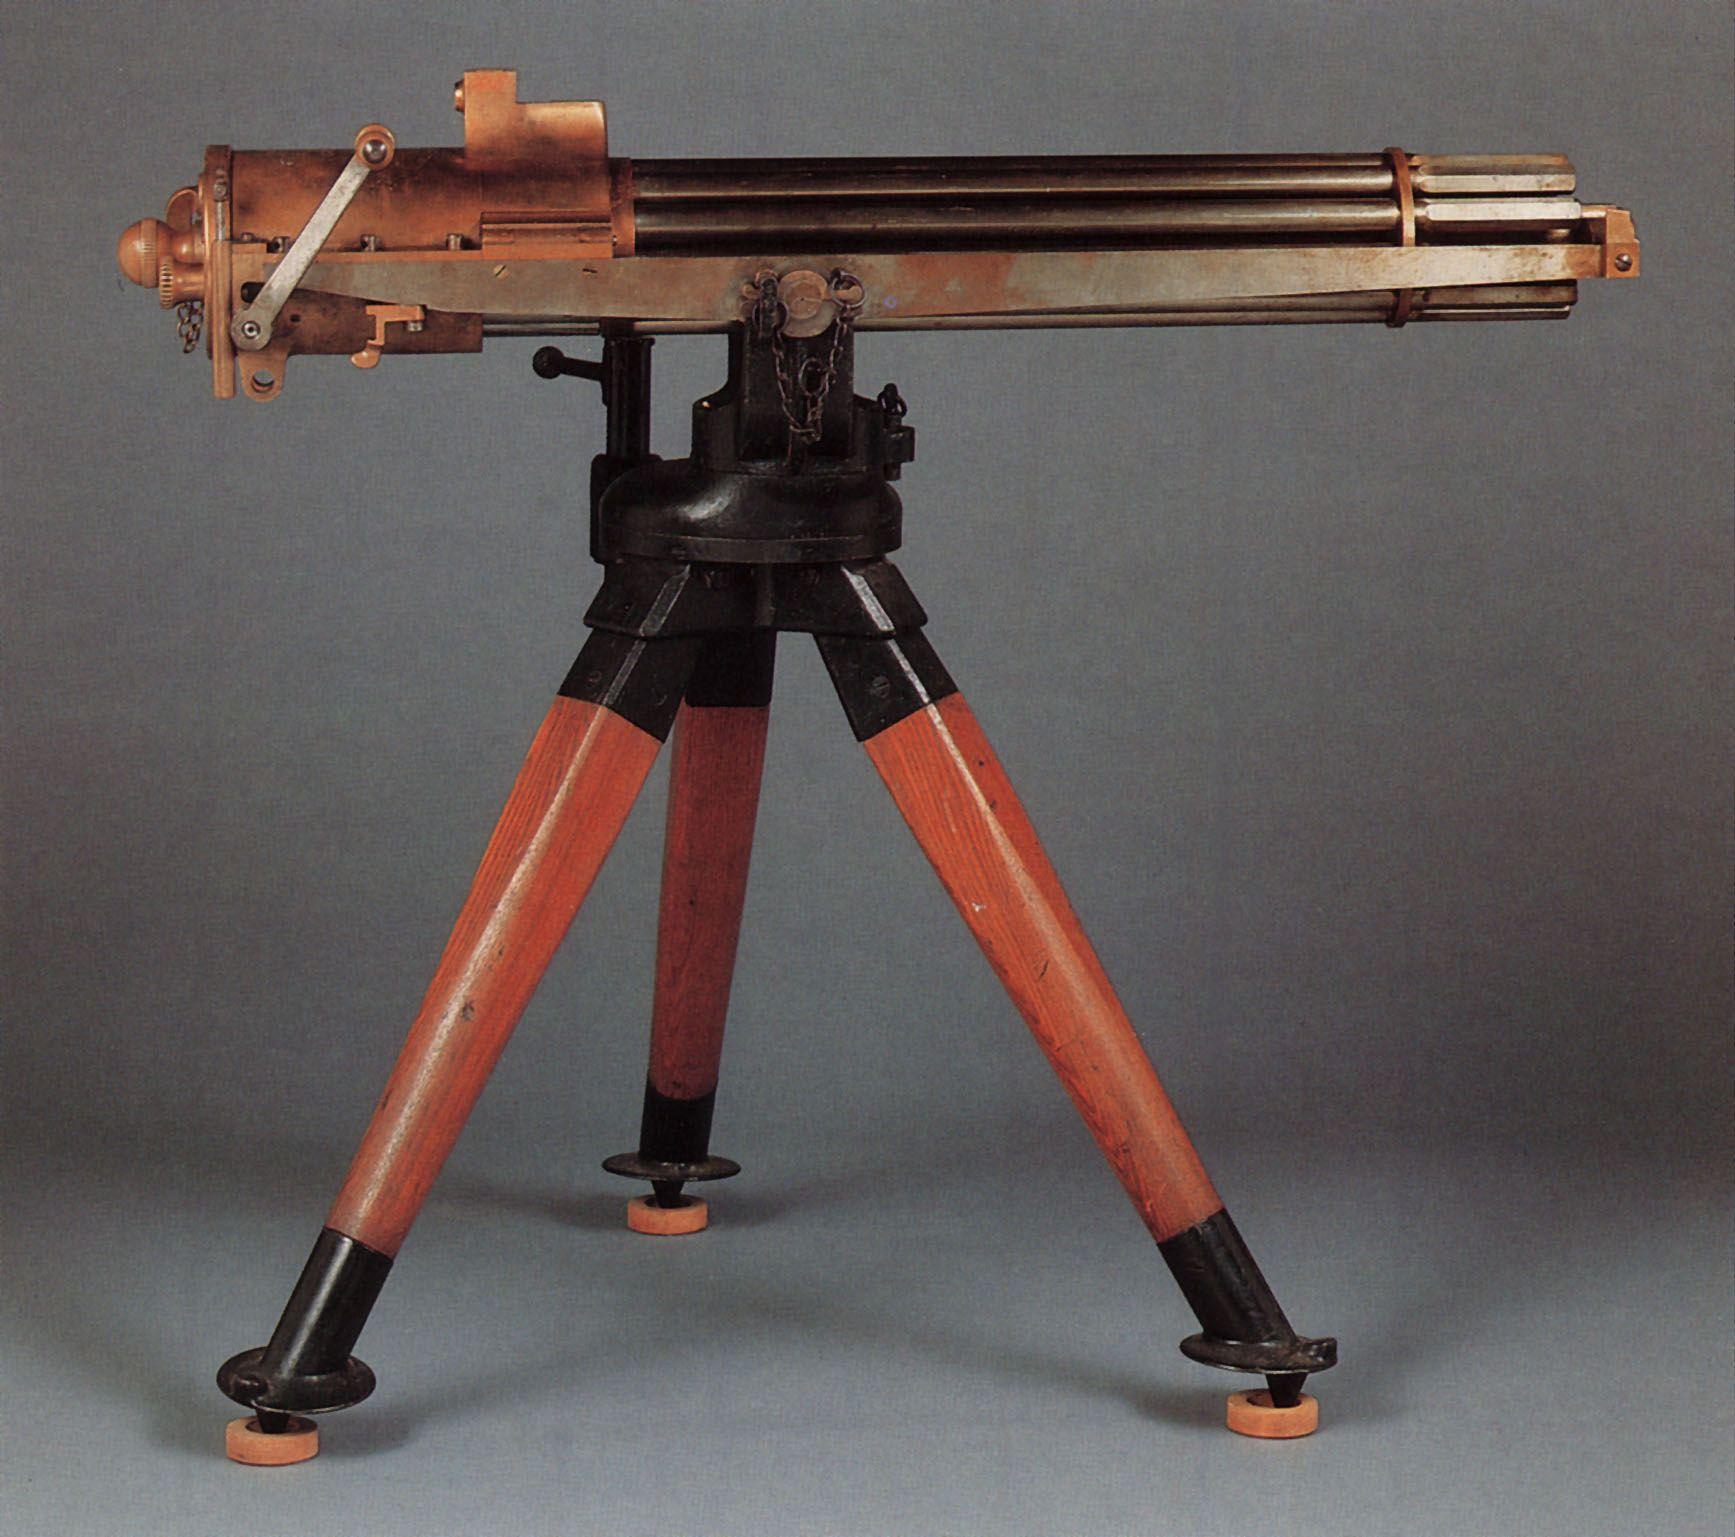 Rough Rider Gatling Gun – This Colt M1895 gatling gun is one